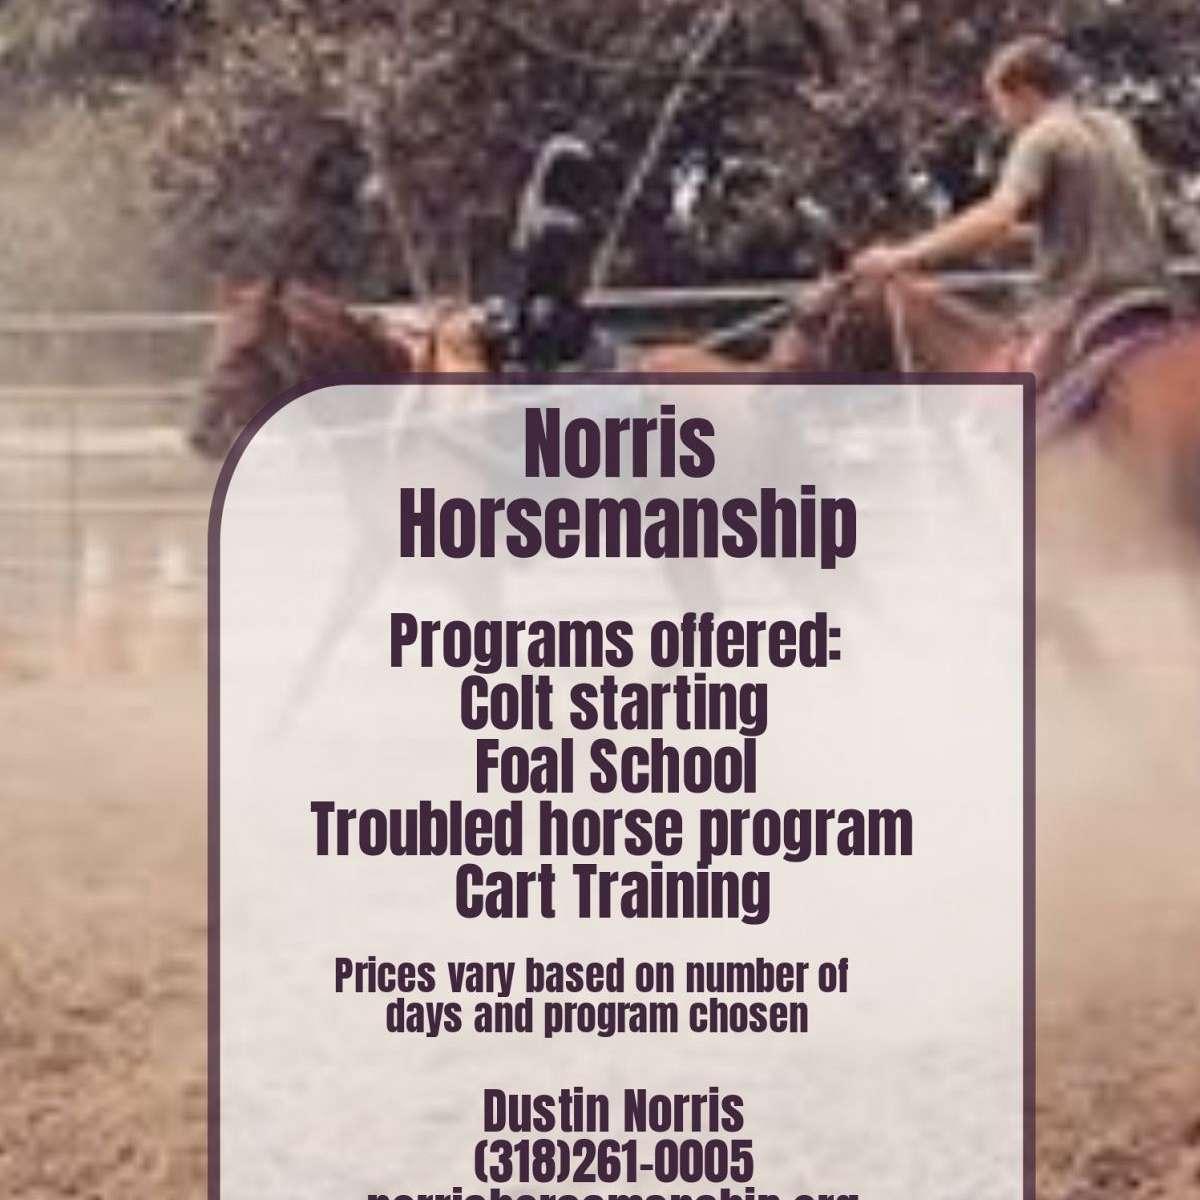 Norris Horsemanship